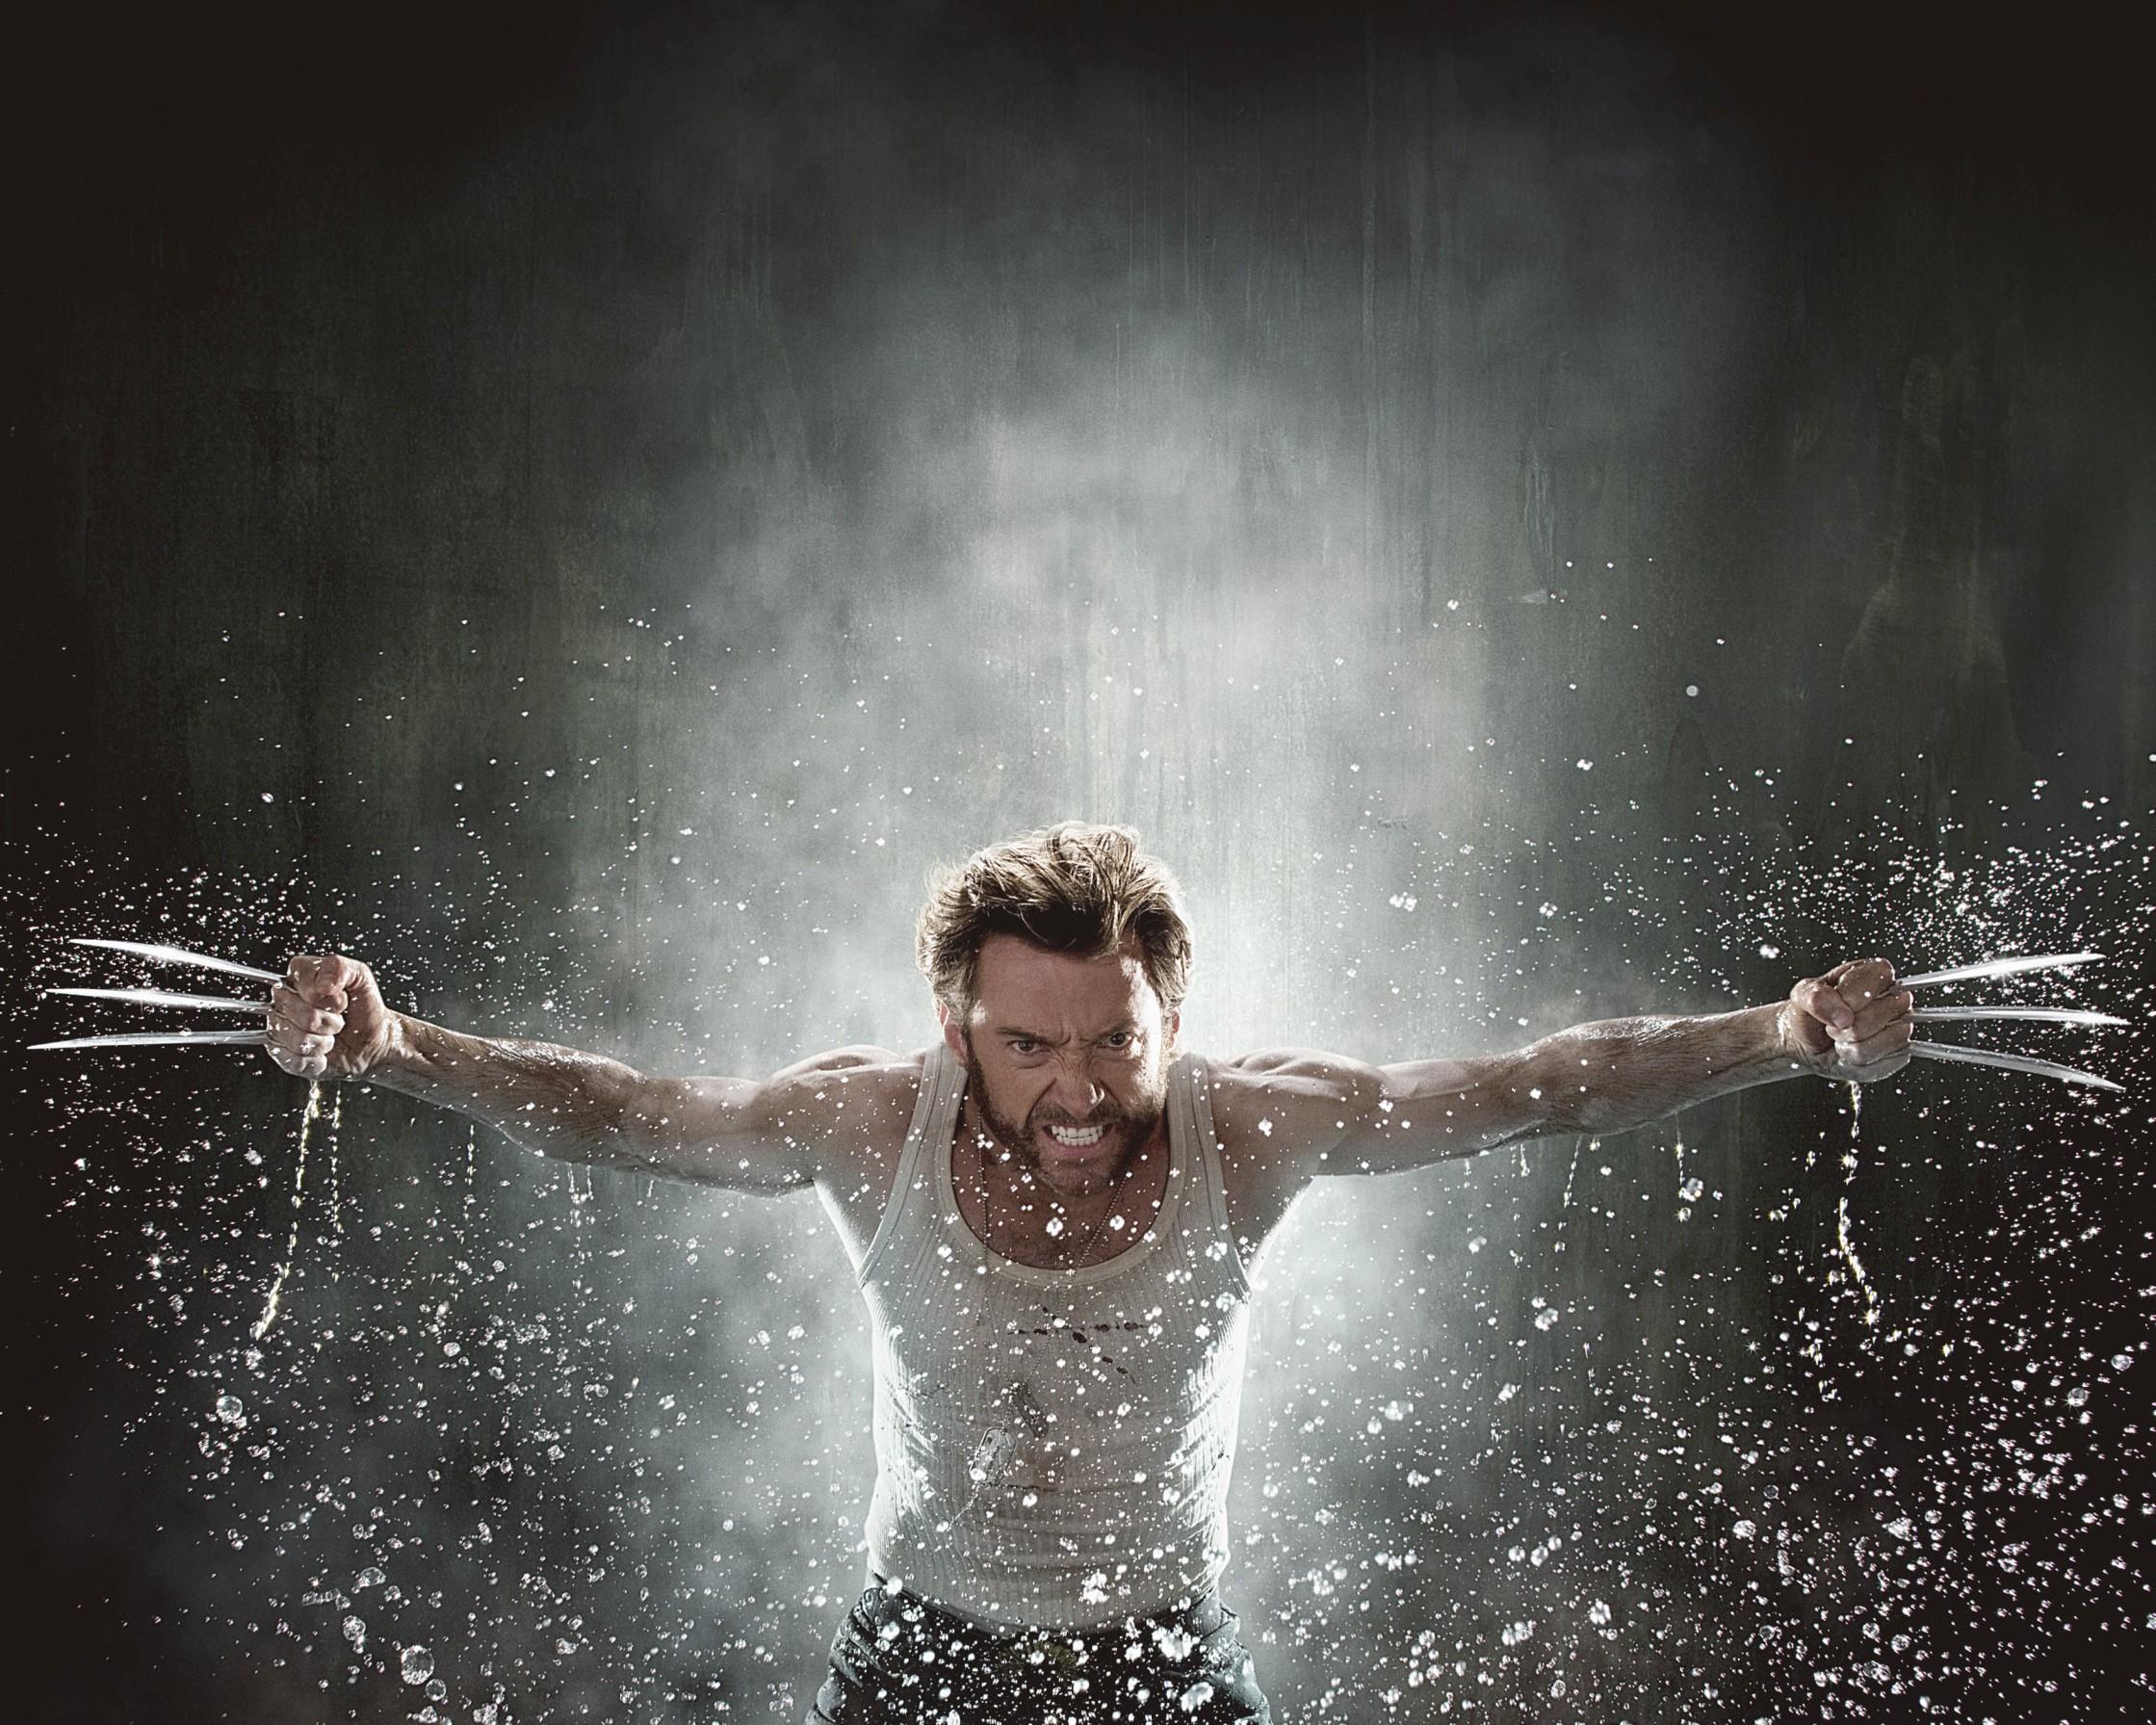 Un wallpaper di Hugh Jackman protagonista del film 'X-Men - Le origini: Wolverine'